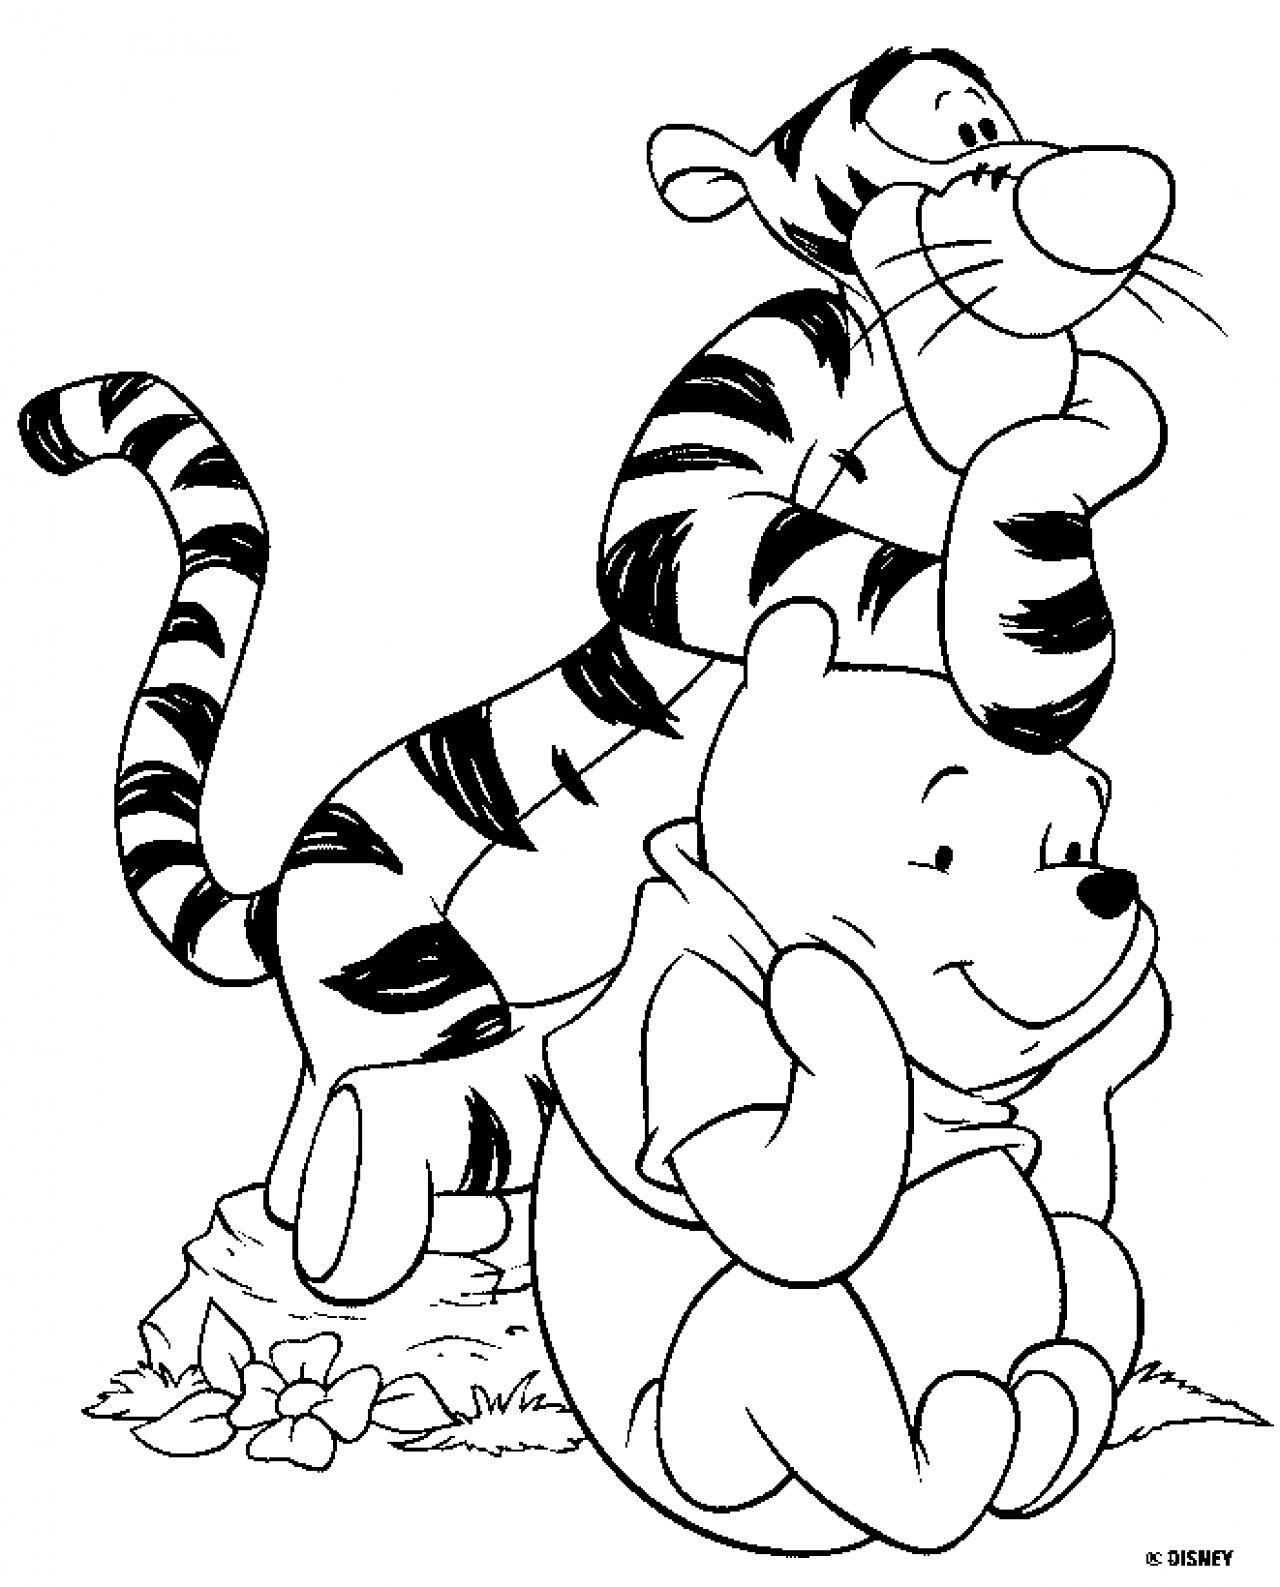 Winnie The Pooh Coloring Pages Printable Car Pictures Disney Kleurplaten Kleurplaten Kleurplaten Voor Kinderen